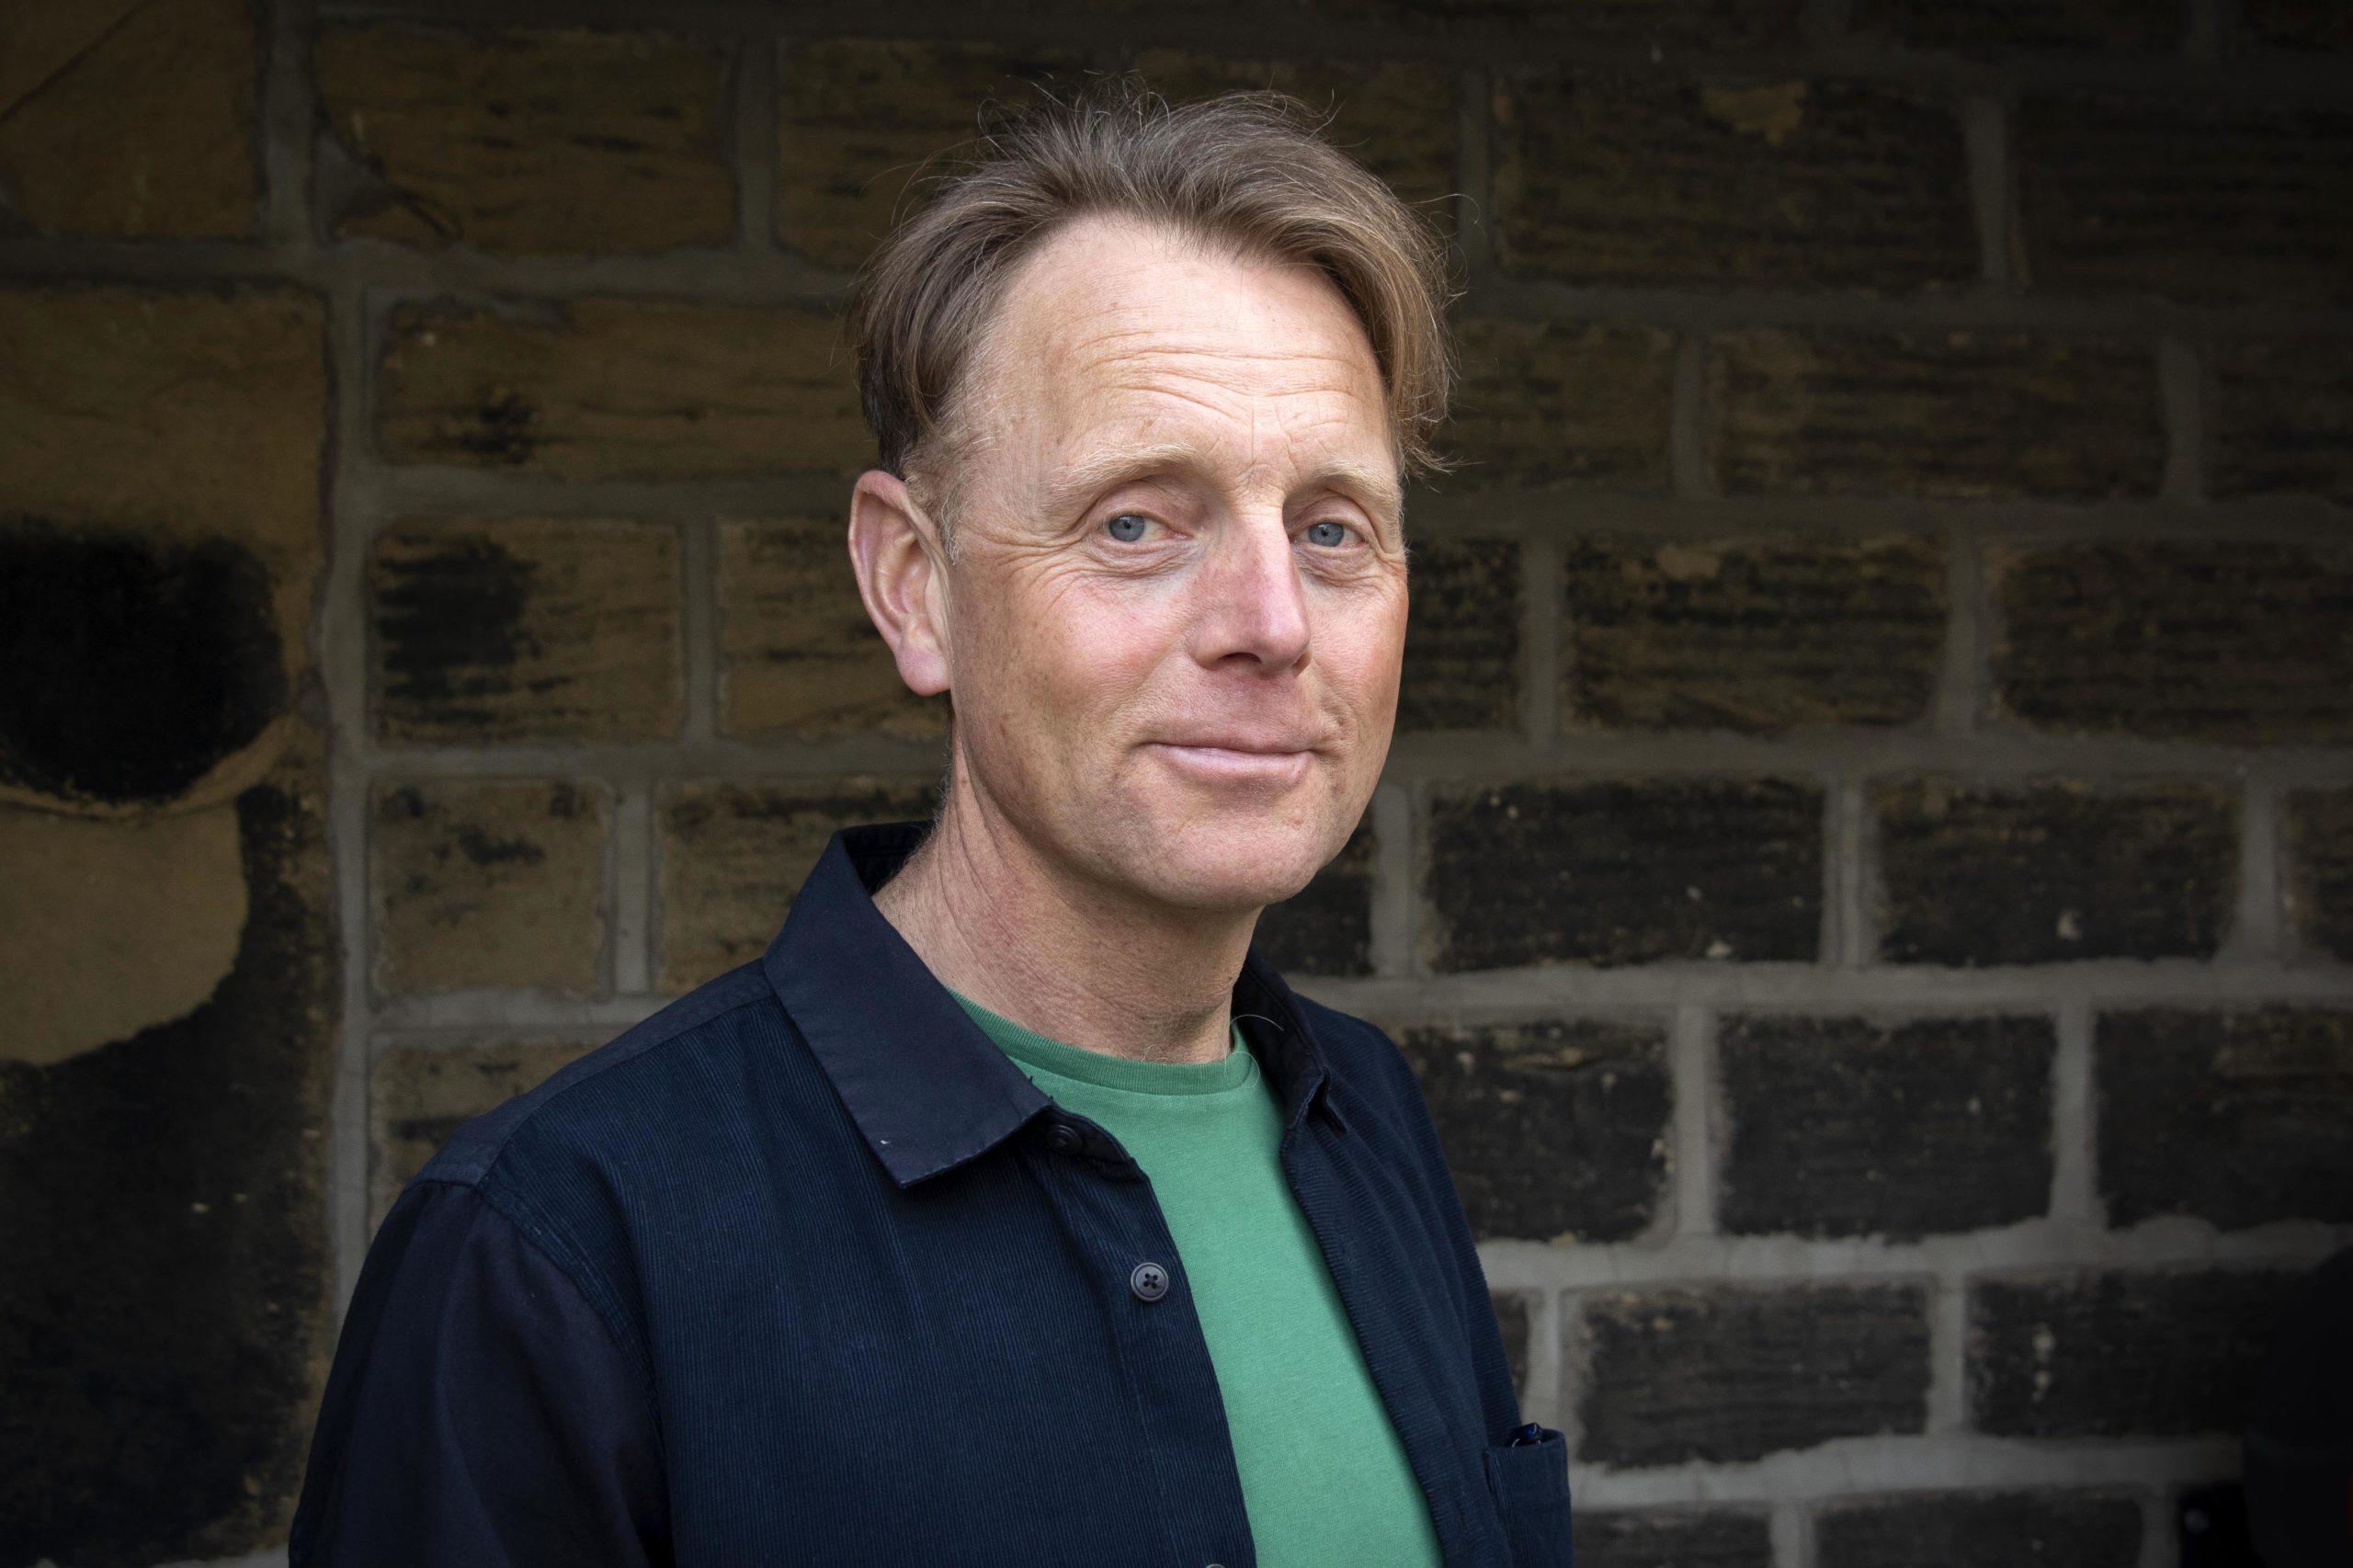 Simon Rippon